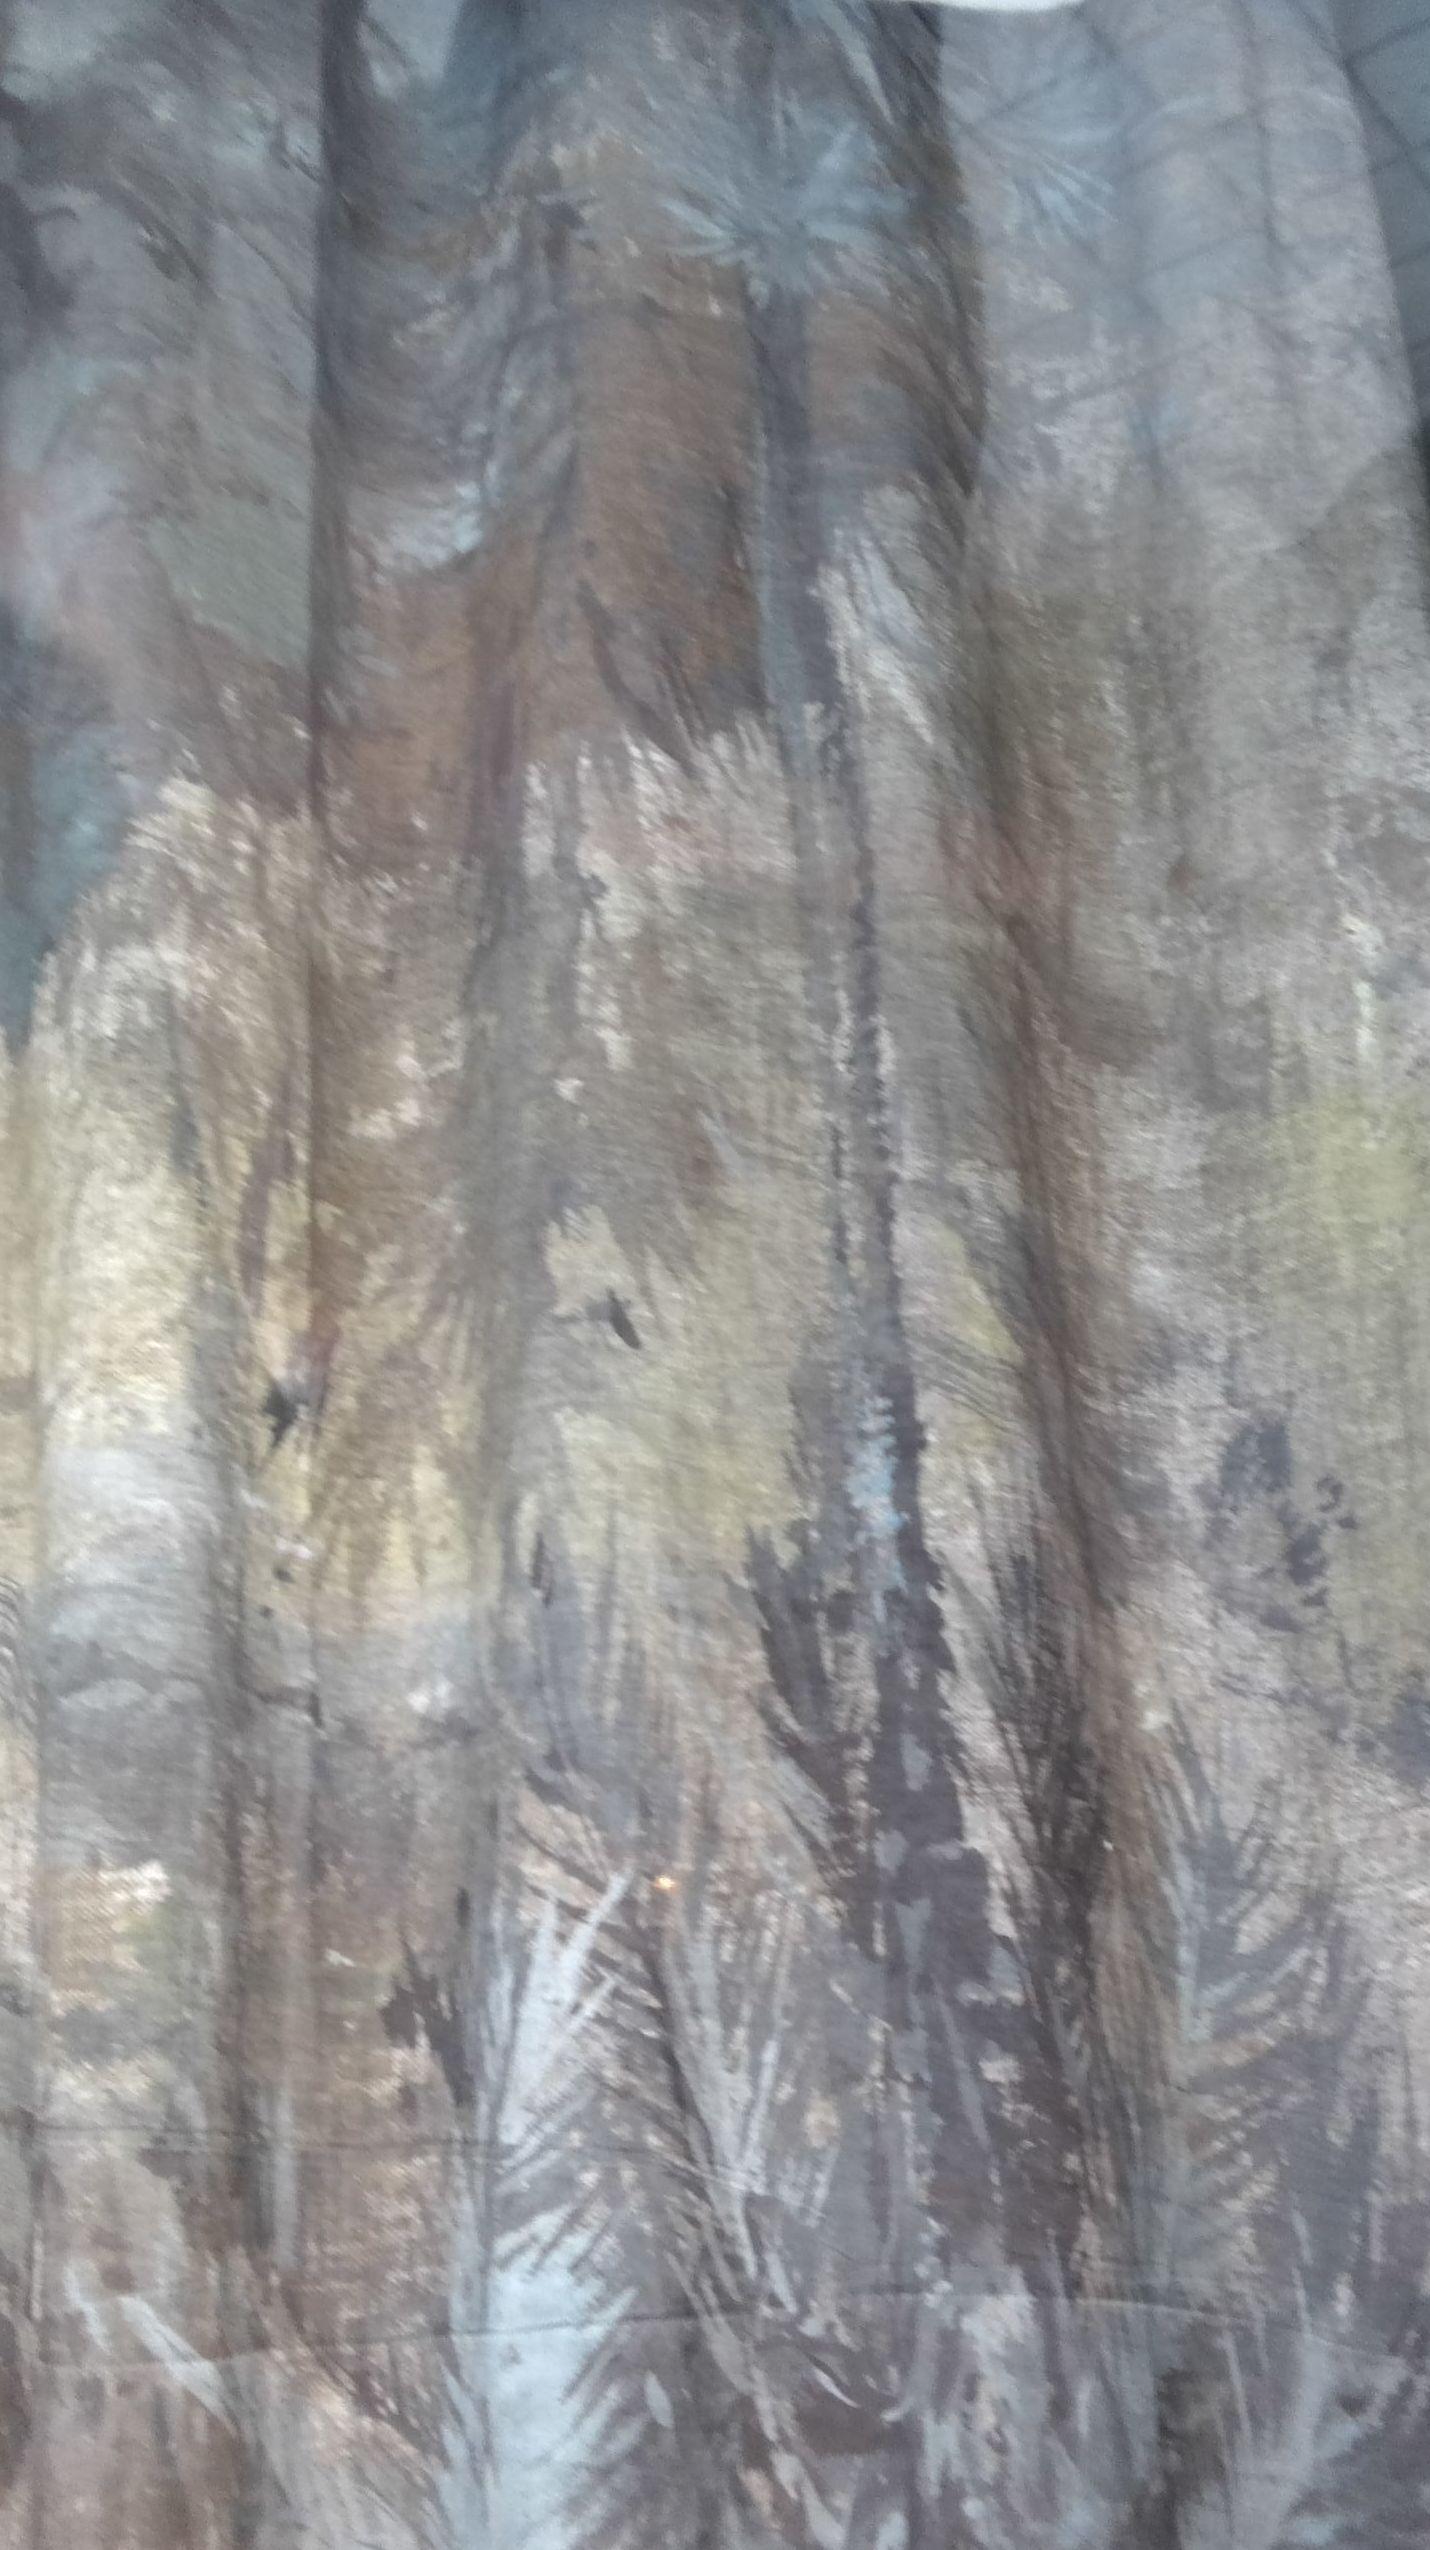 Foto 4 de Decoración textil en Madrid | Diseño Textil